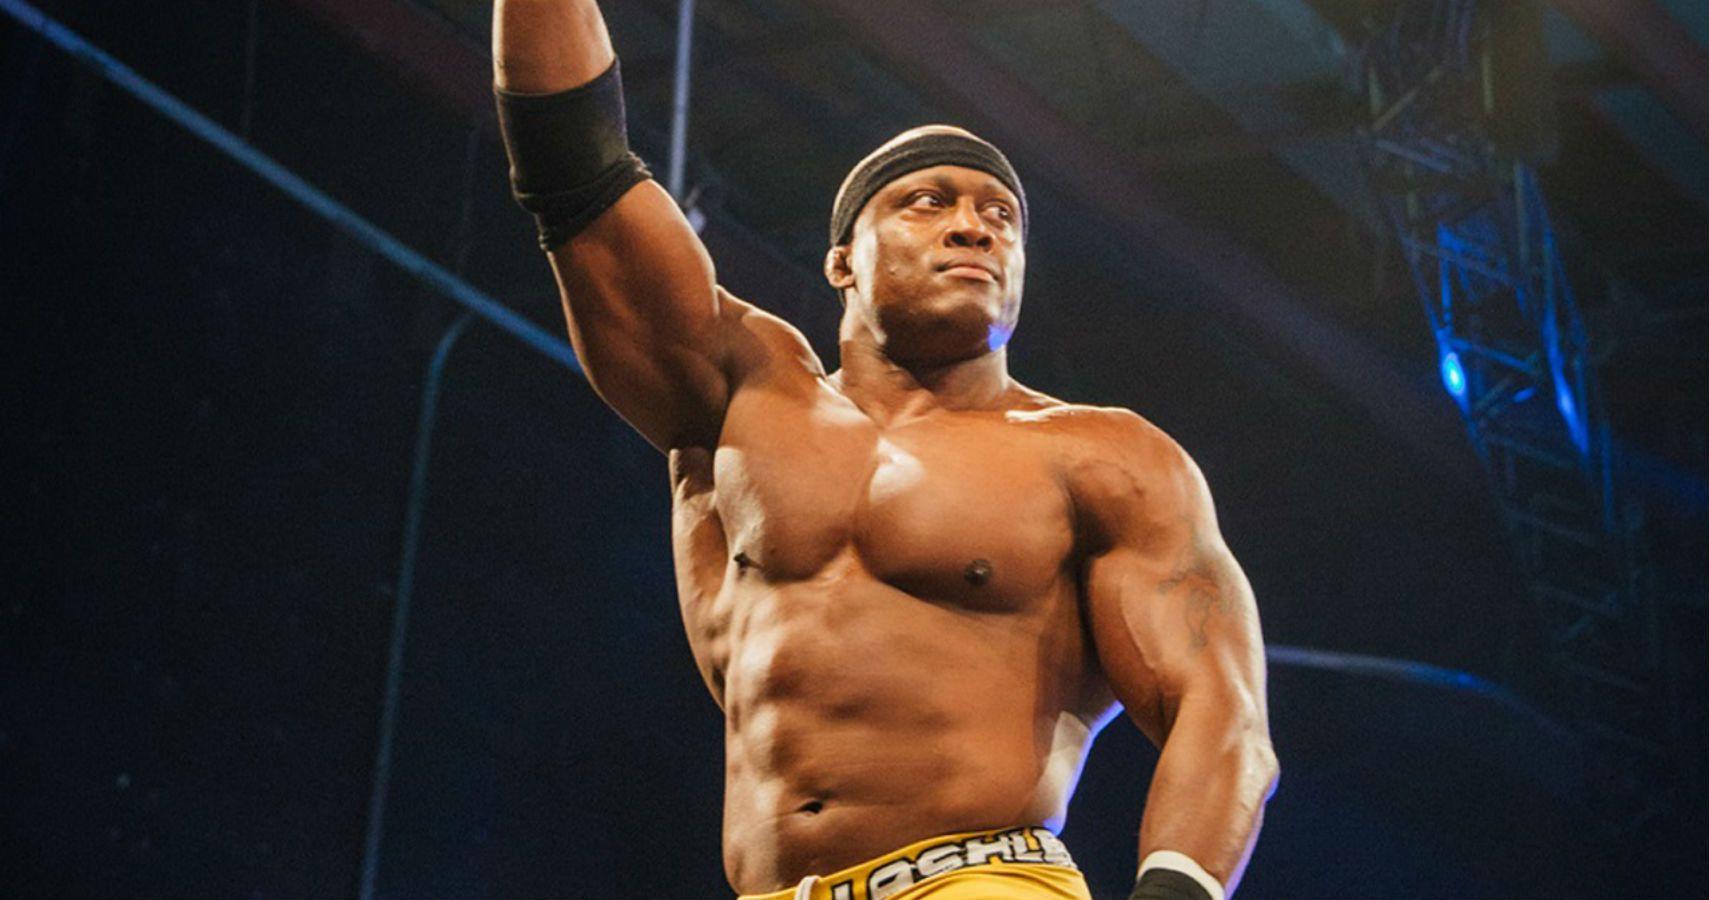 rumor  bobby lashley to return to wwe on wrestlemania weekend